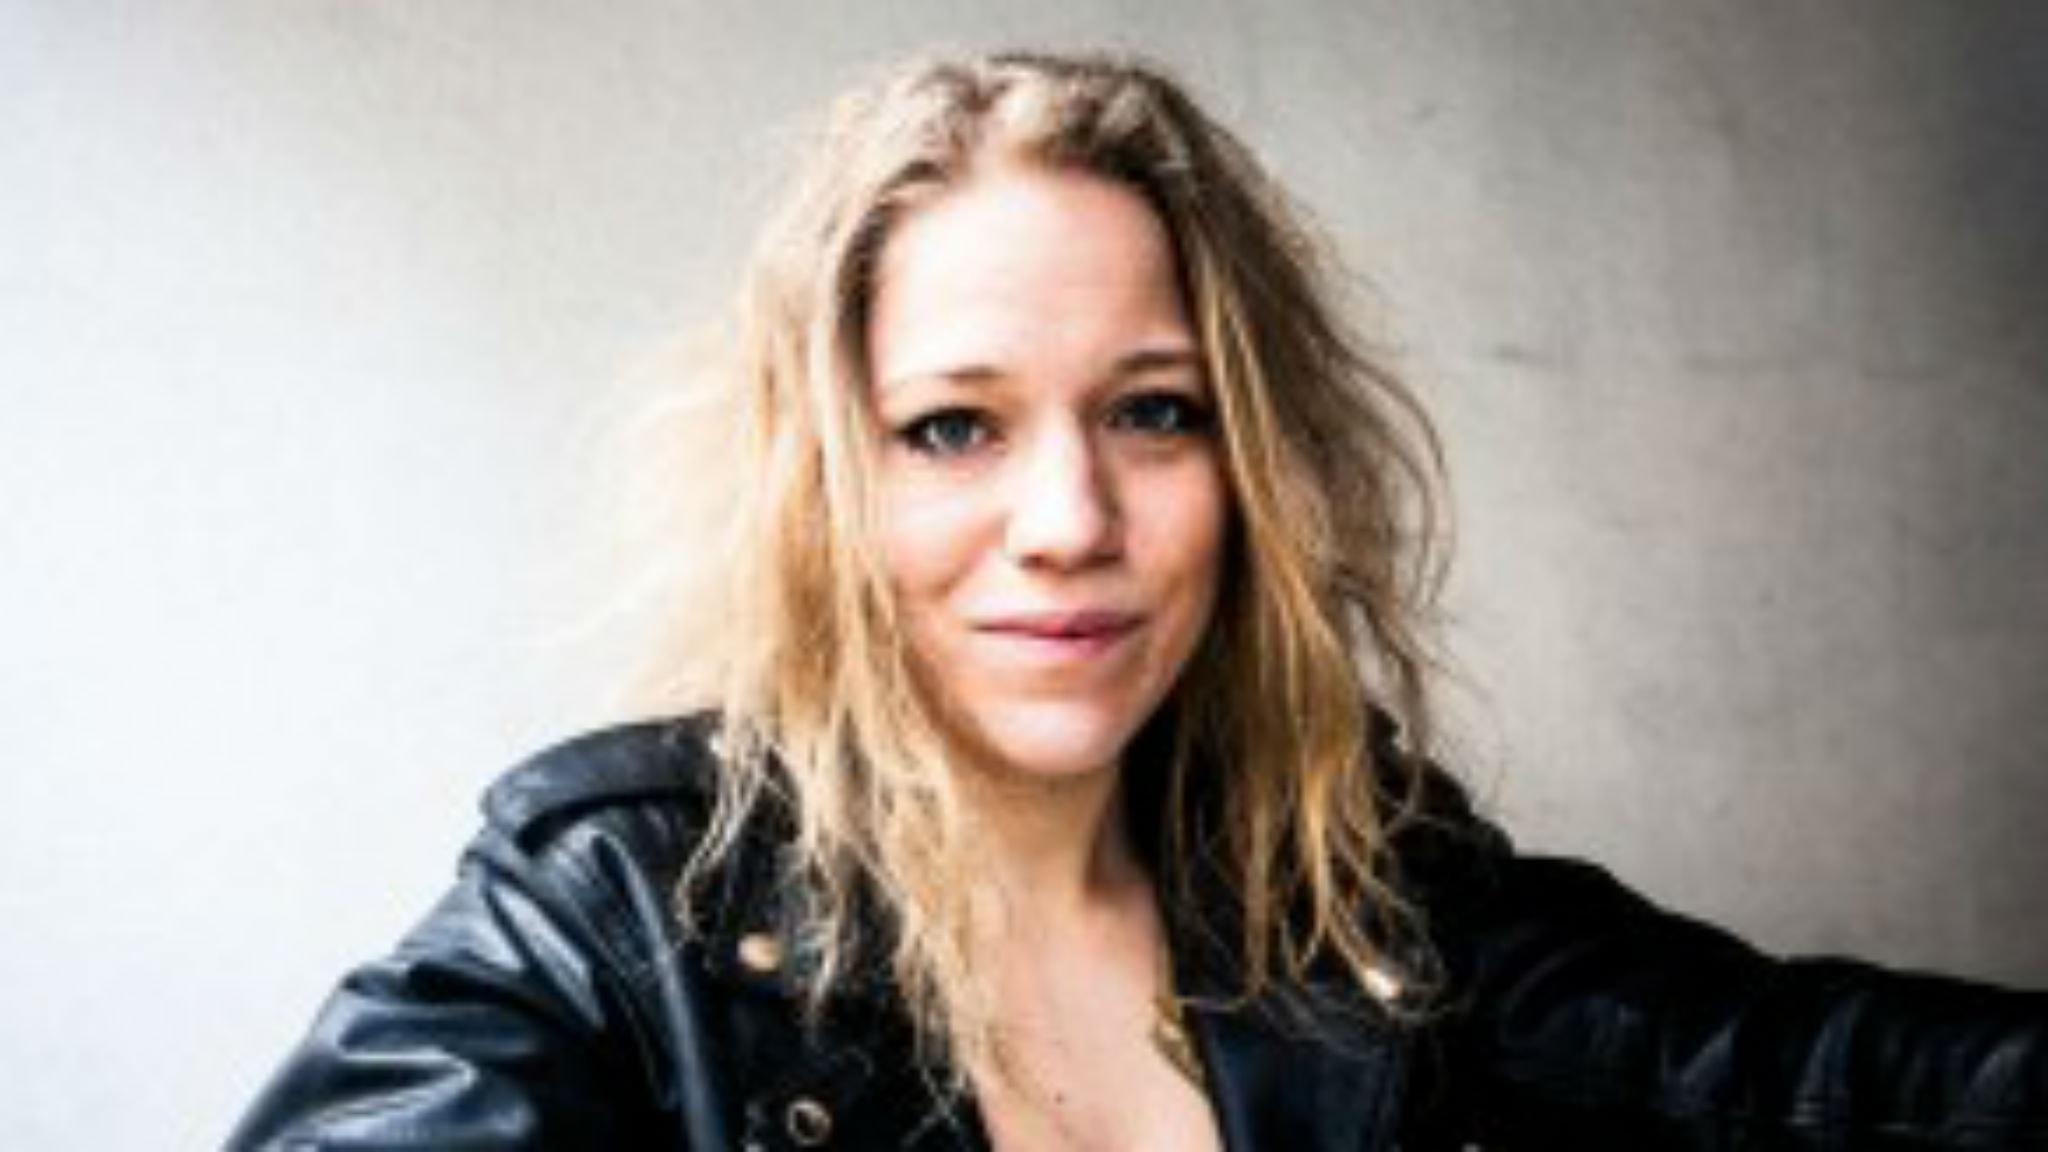 Olivia Bergdahl